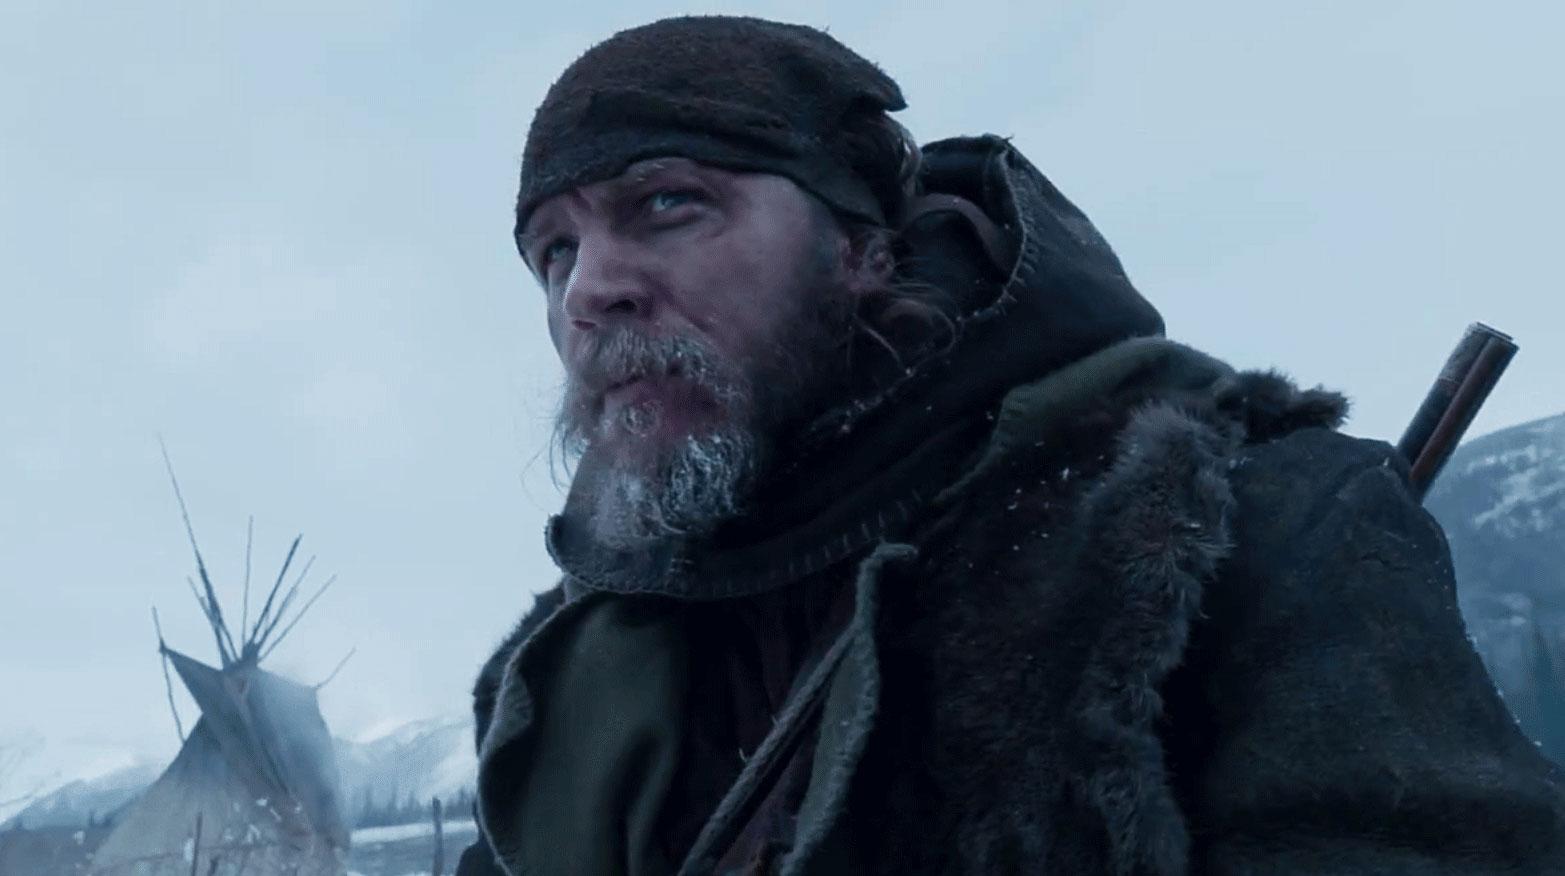 Tom Hardy as John Fitzgerald in Iñárritu's The Revenant, 2015